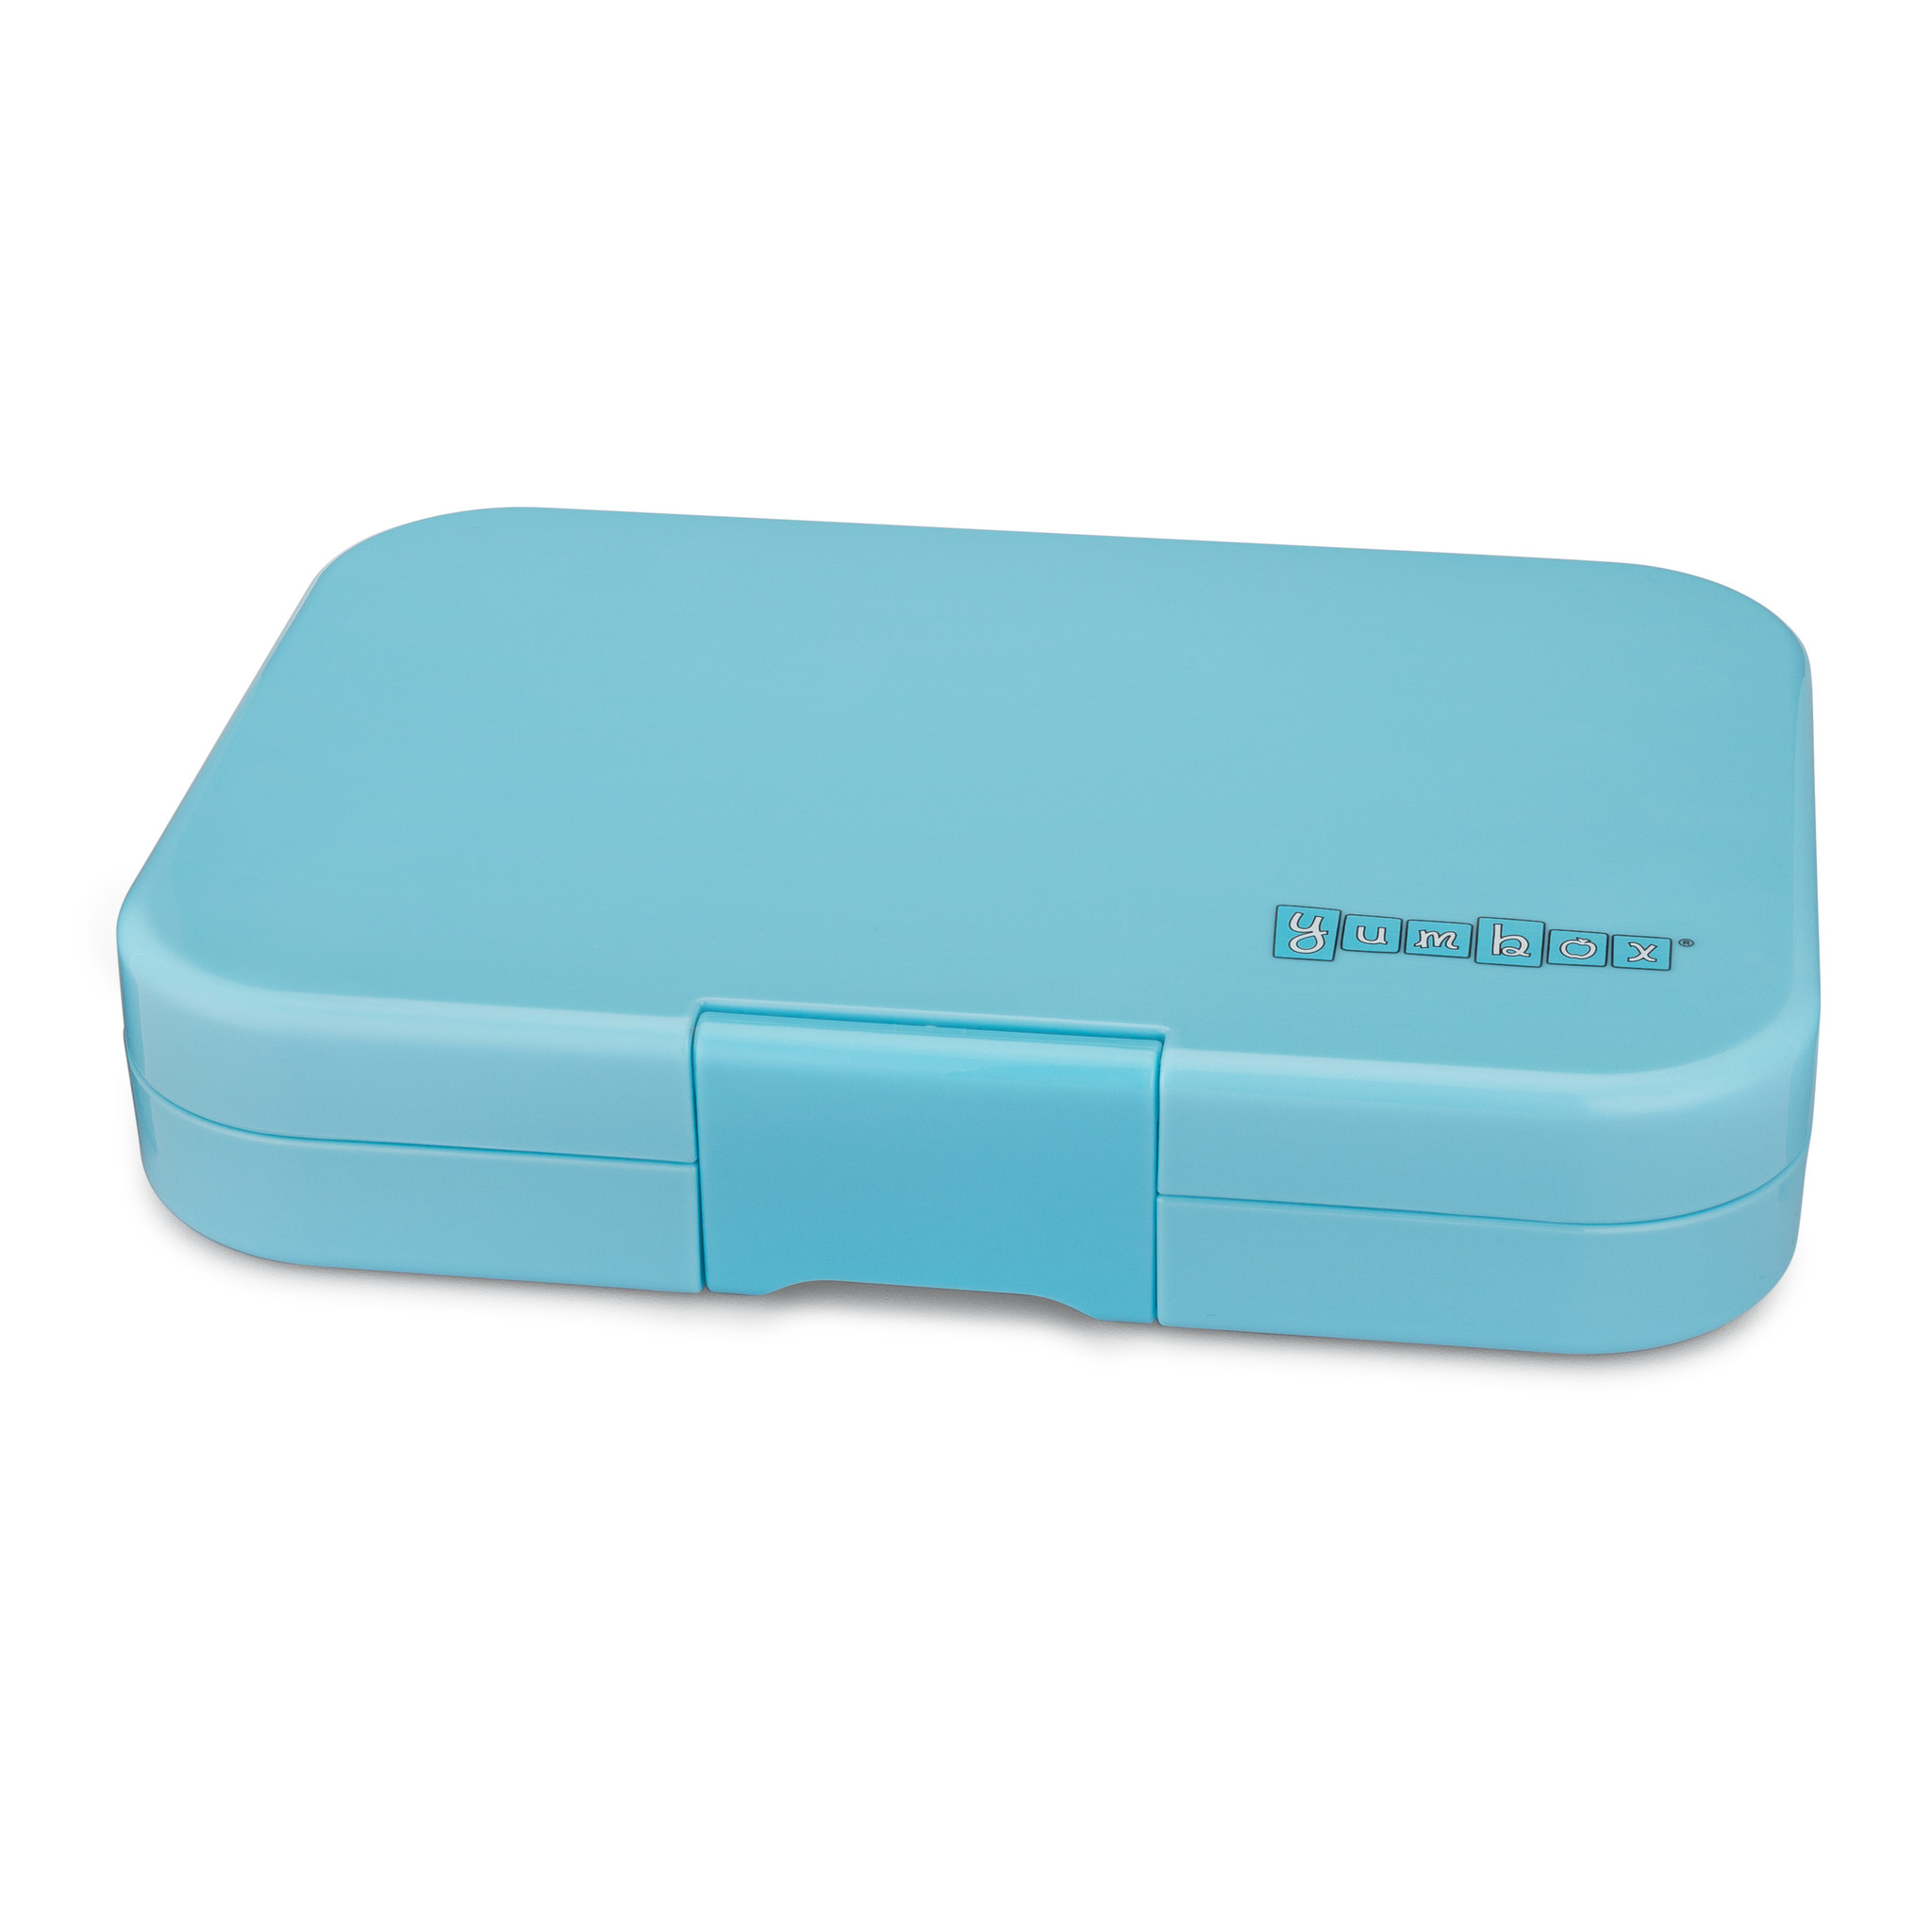 Yumbox Tapas XL lunchbox Nevis blue / Bon appetit tray 5-sections-3